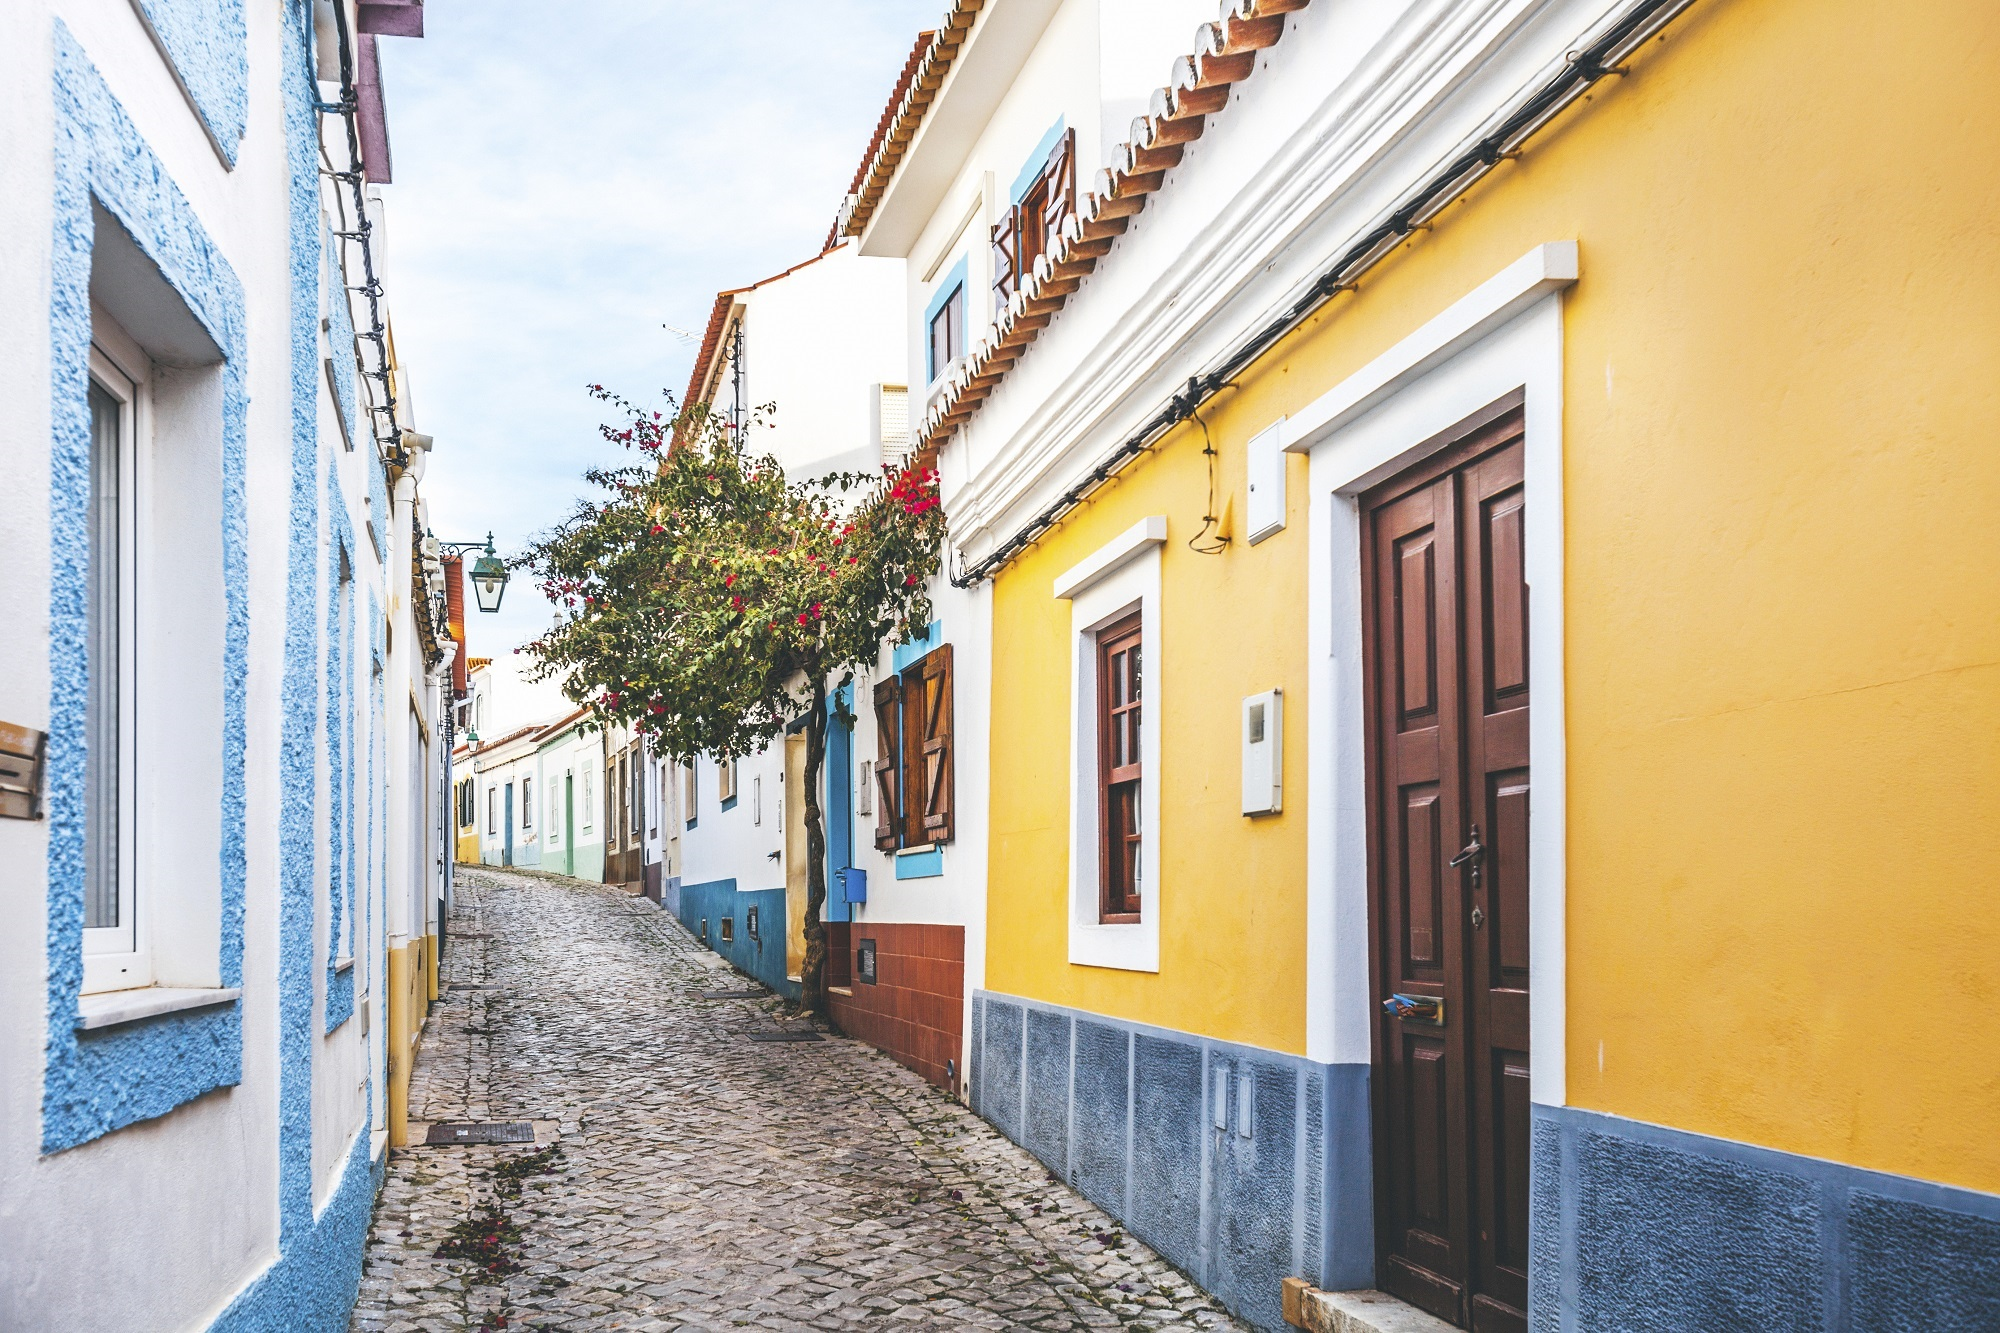 Immobilier : comment acheter malin au Portugal ?